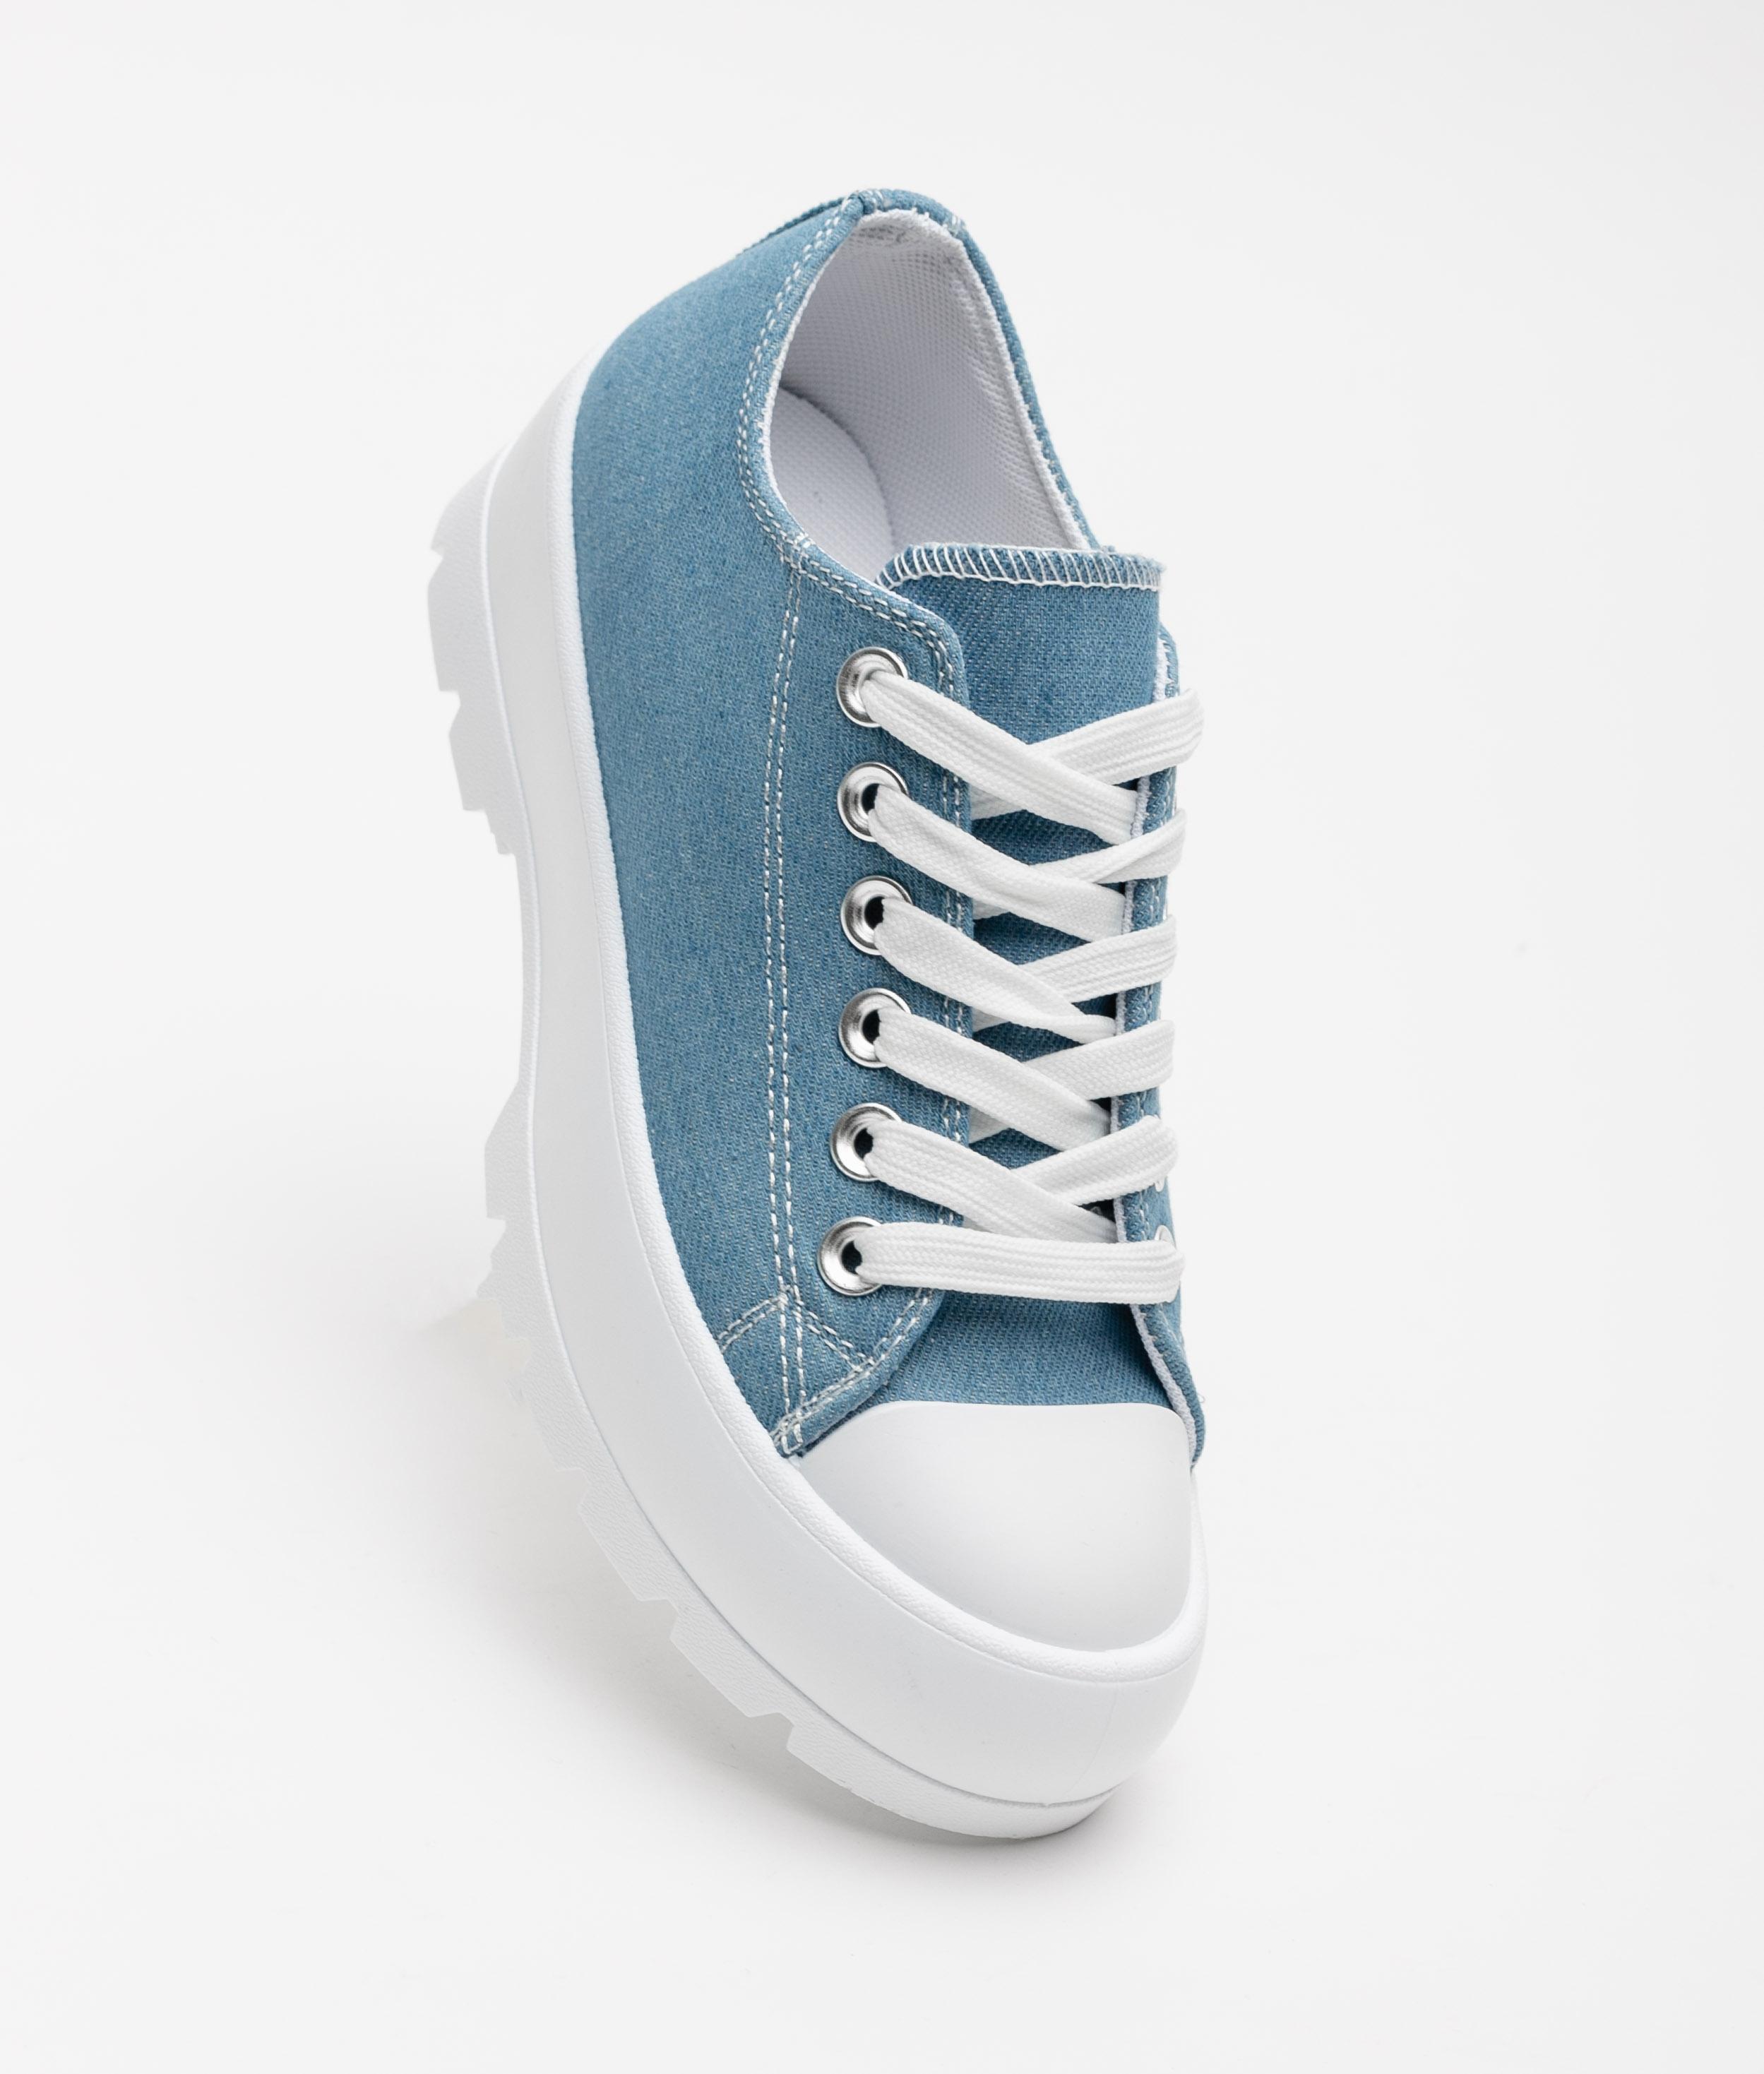 Sneakers CLETA - BLEU